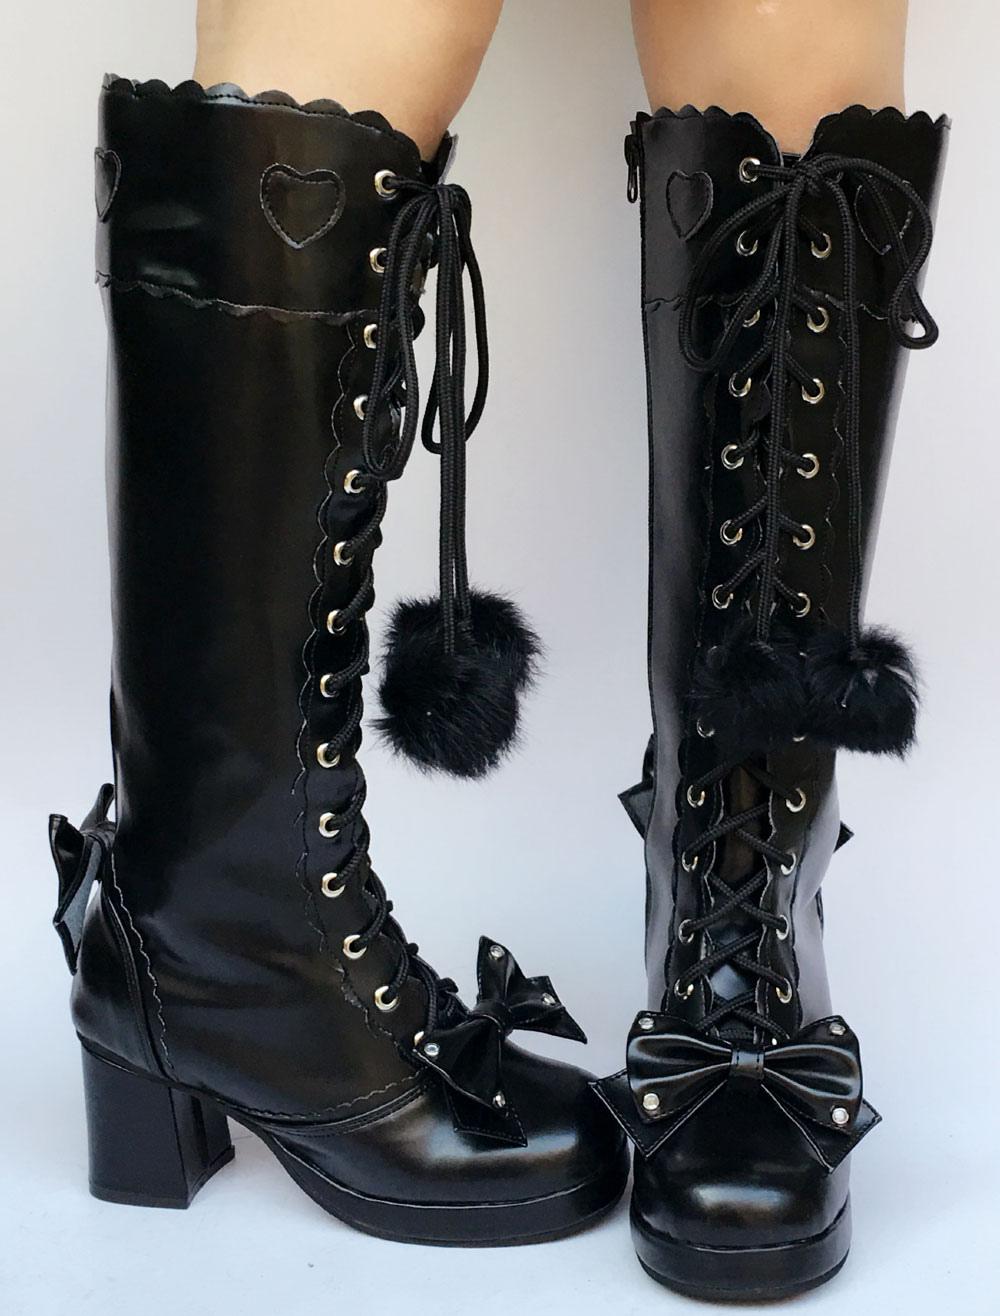 Dulce Lolita botas hasta la rodilla negro grueso tacón plataforma encaje arco corazón Lolita botas altas con bola difusa IWDD9oPv0S